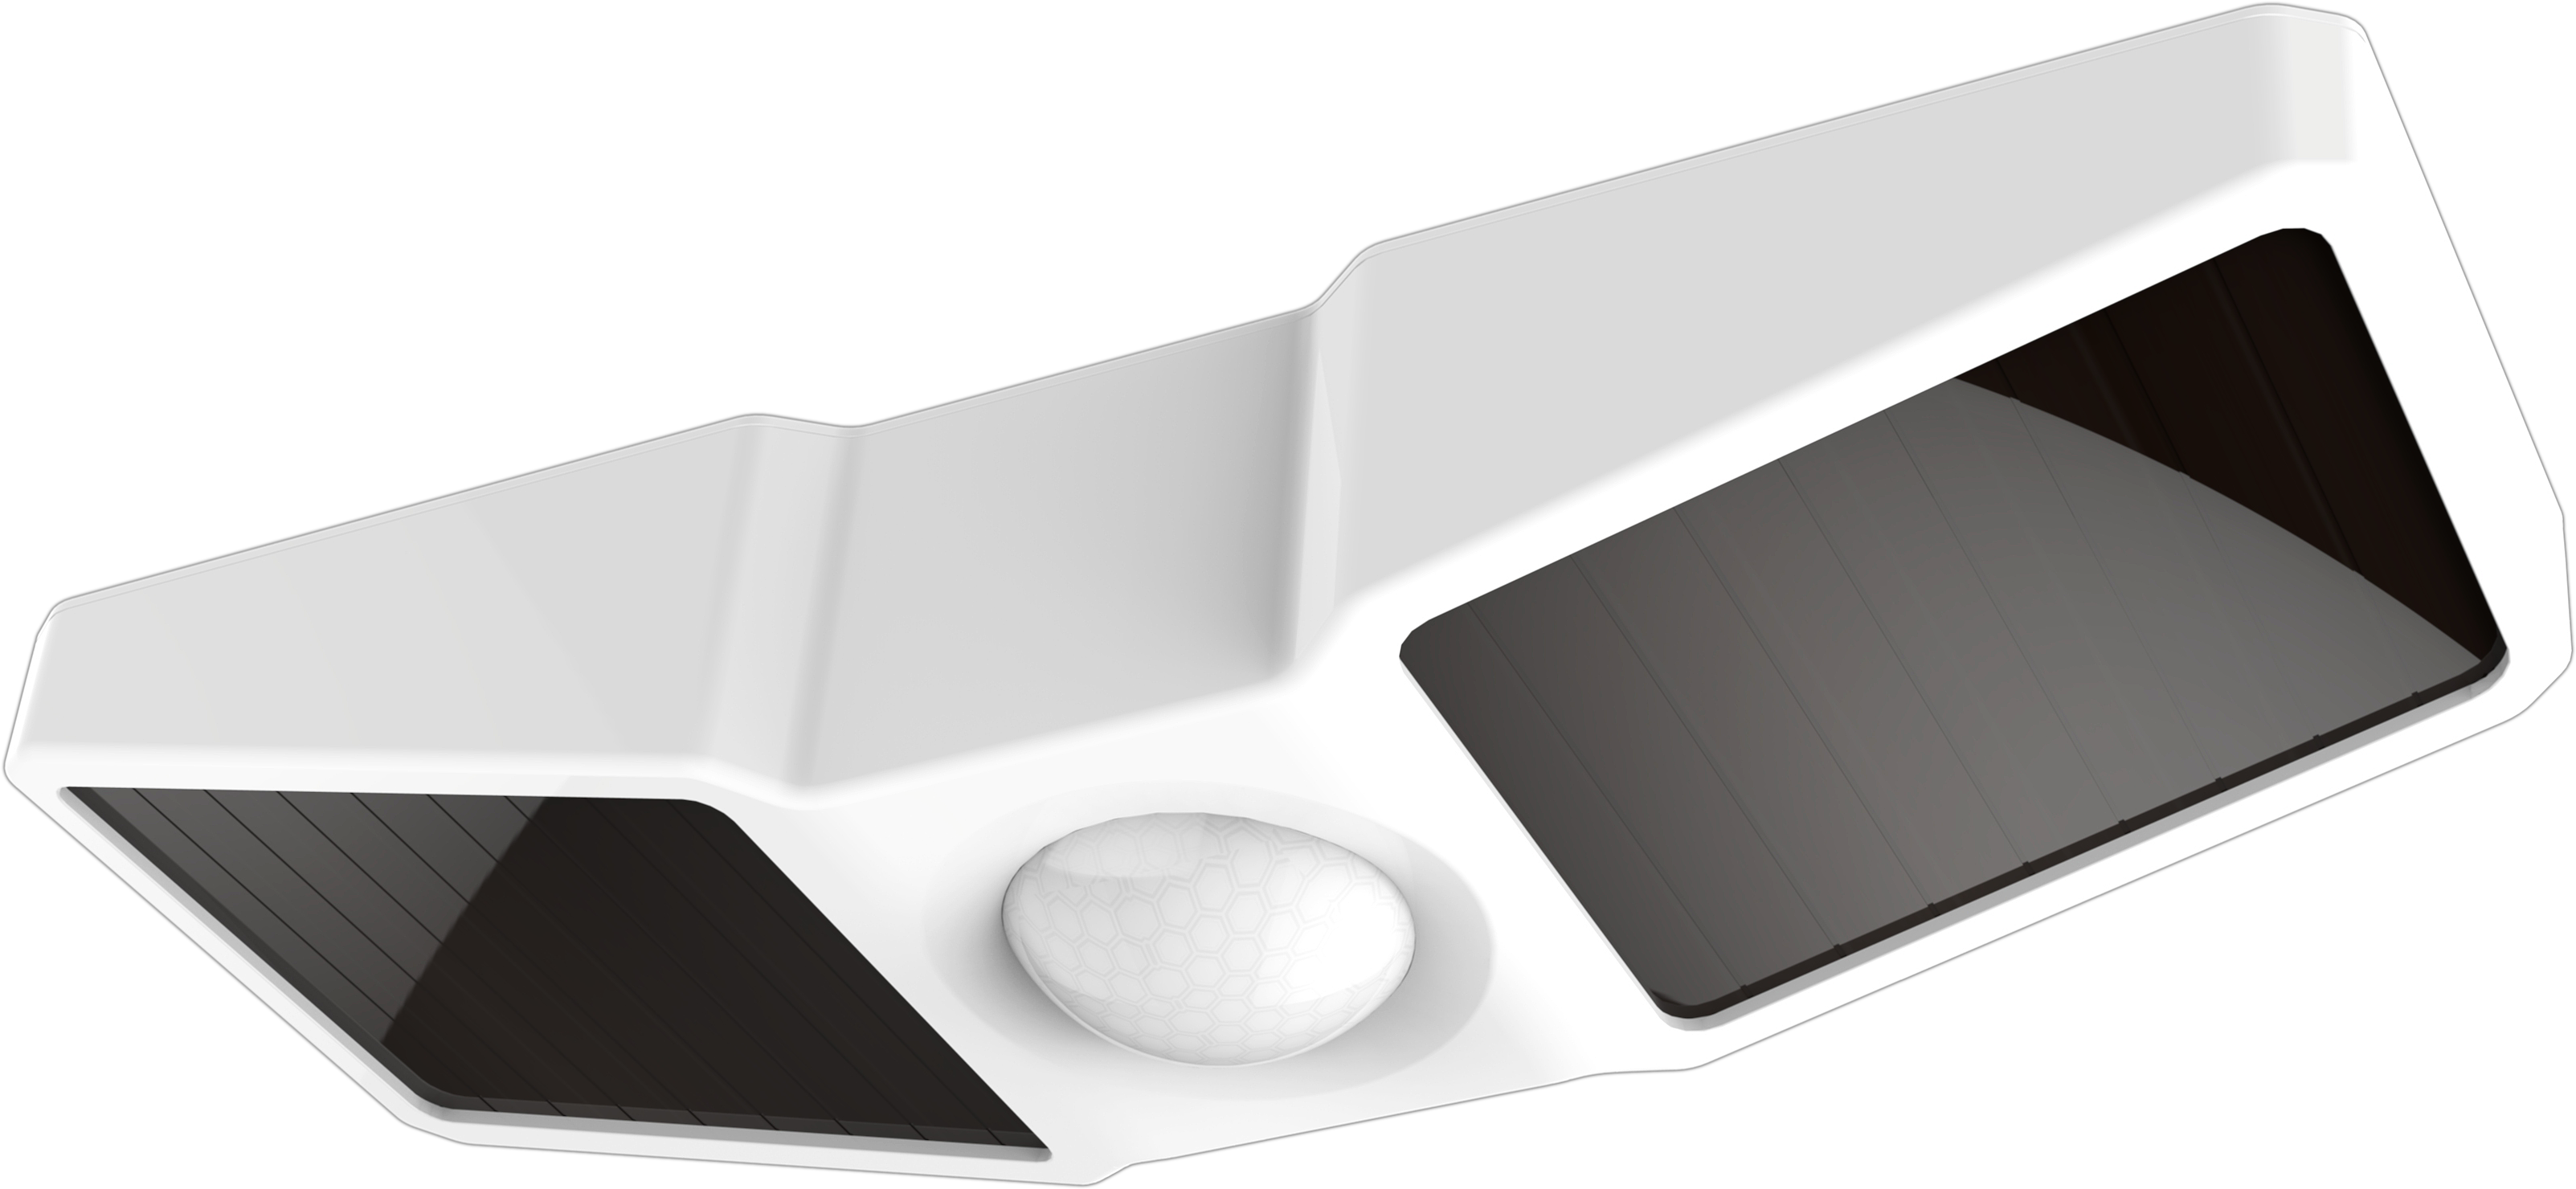 solar powered occupancy sensor enocean alliance. Black Bedroom Furniture Sets. Home Design Ideas